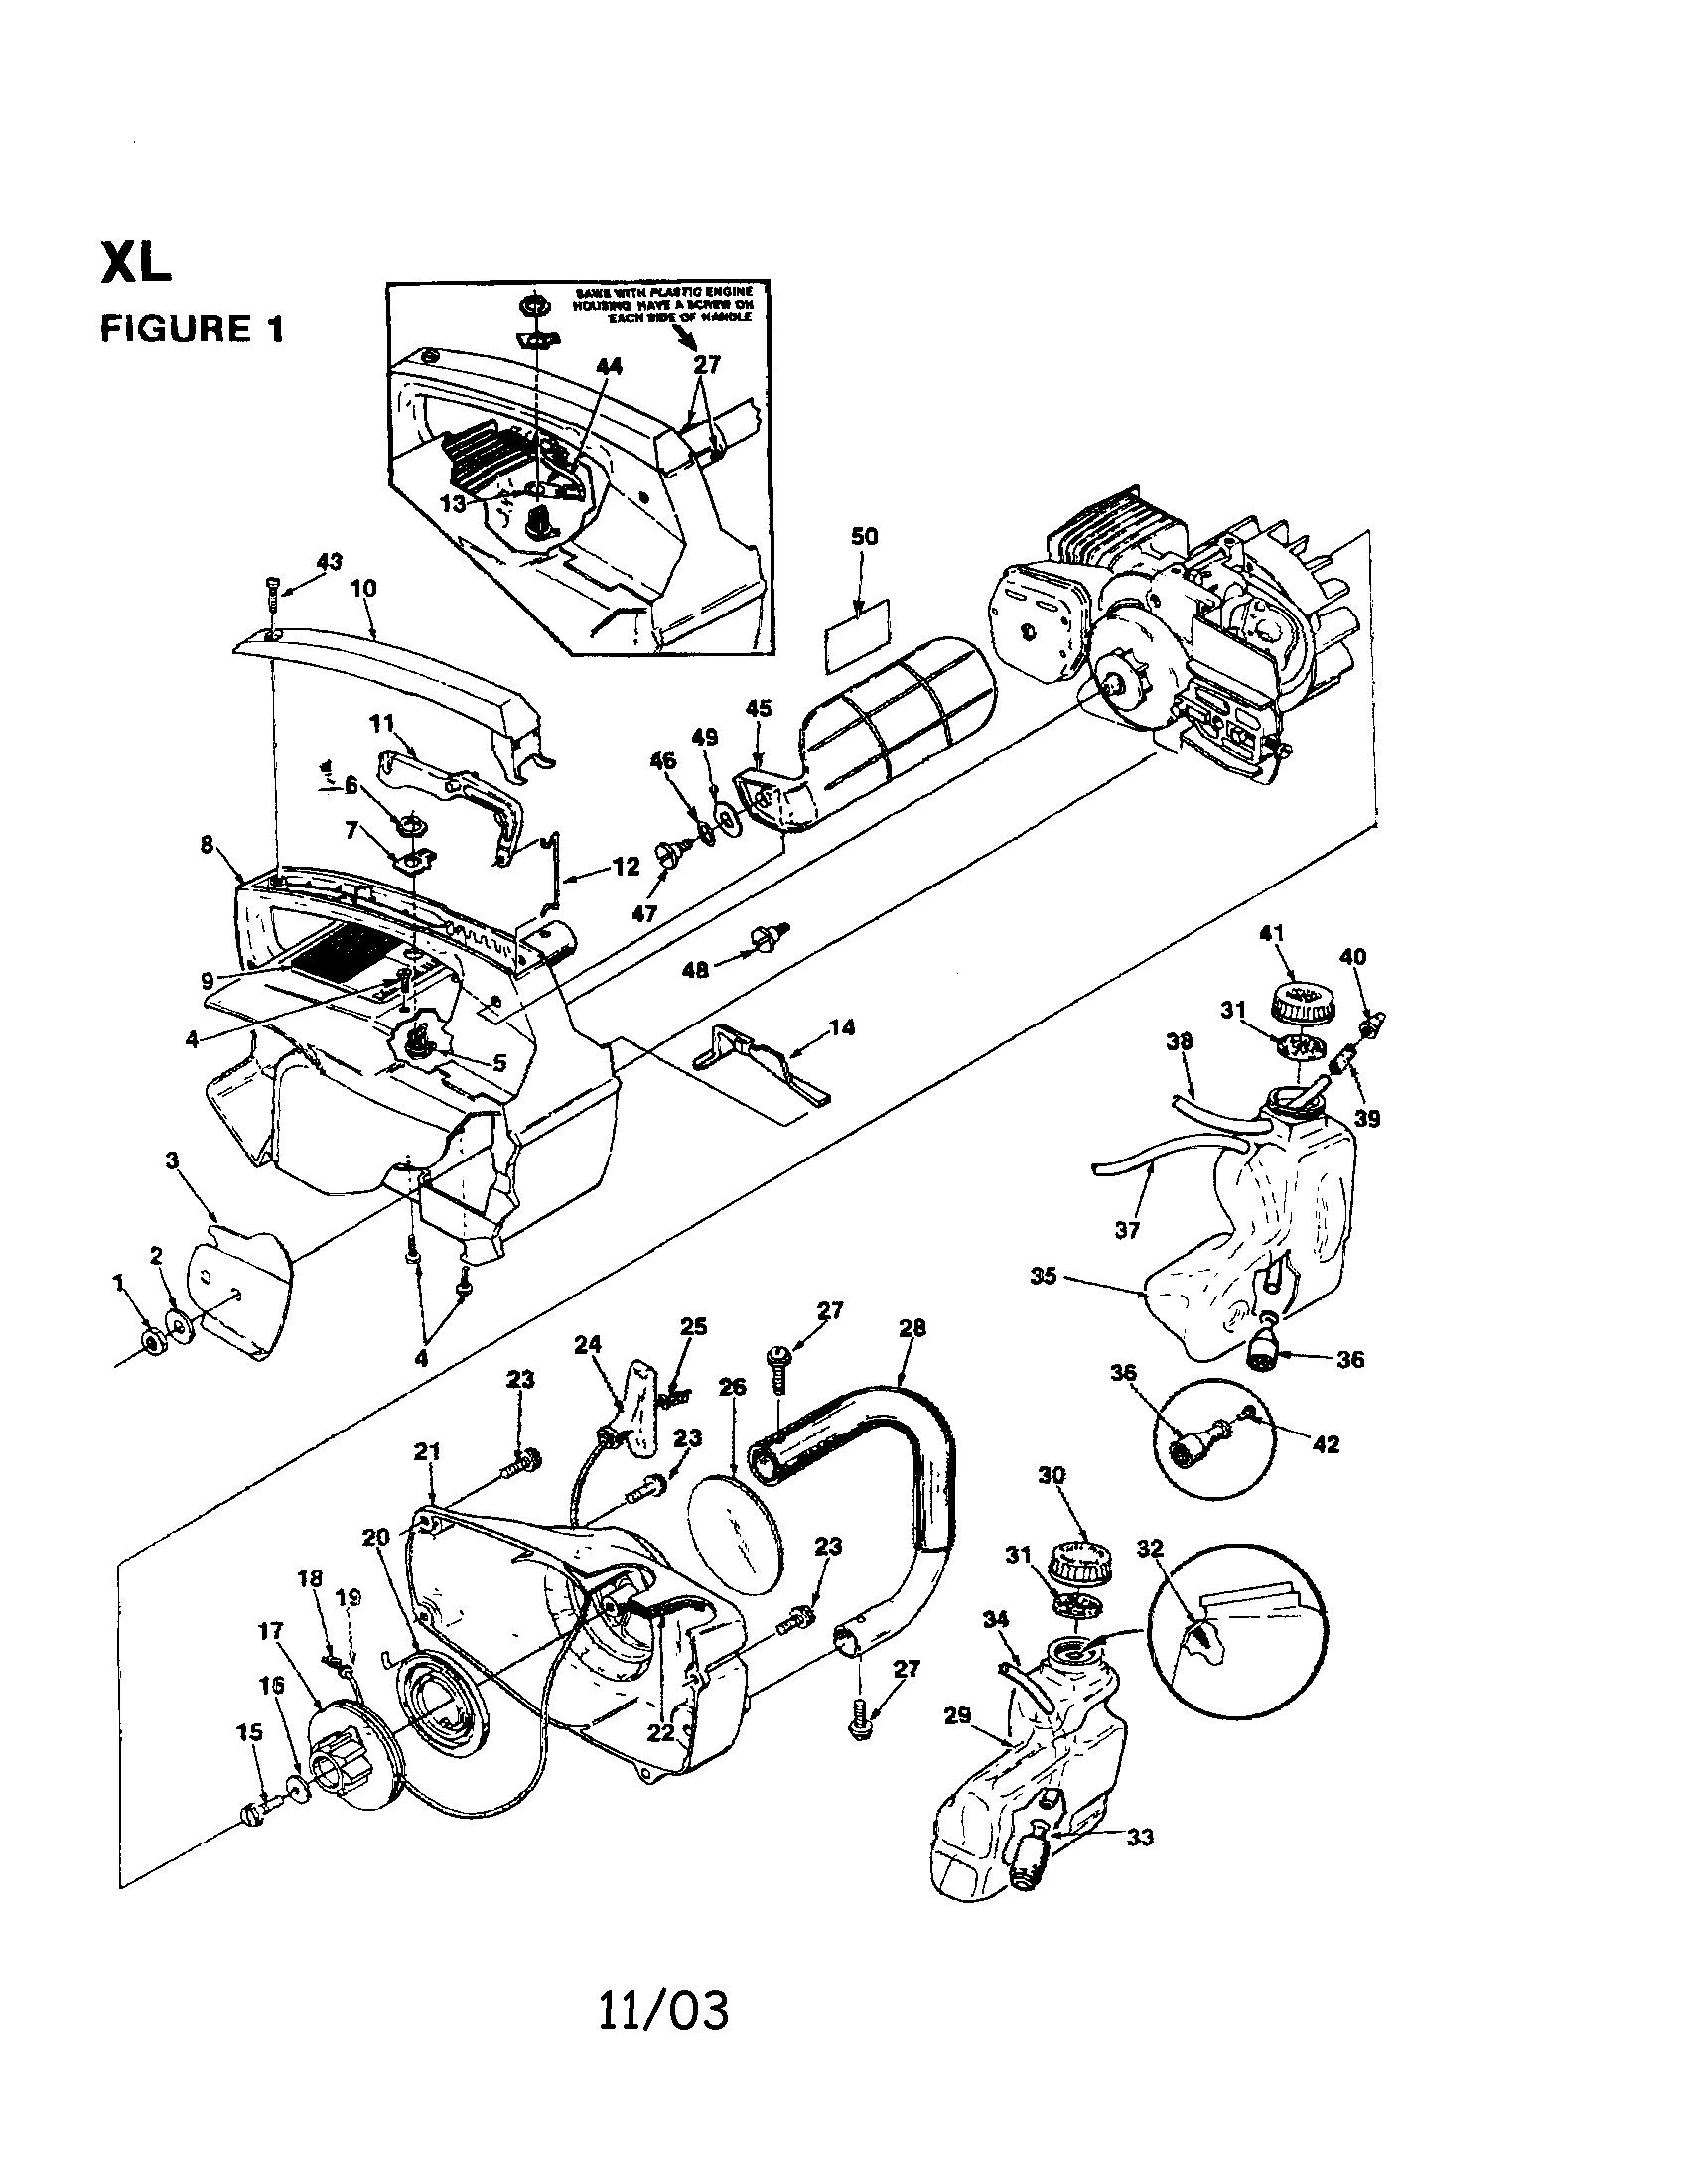 Craftsman Chainsaw Carburetor Fuel Line Diagram, Craftsman